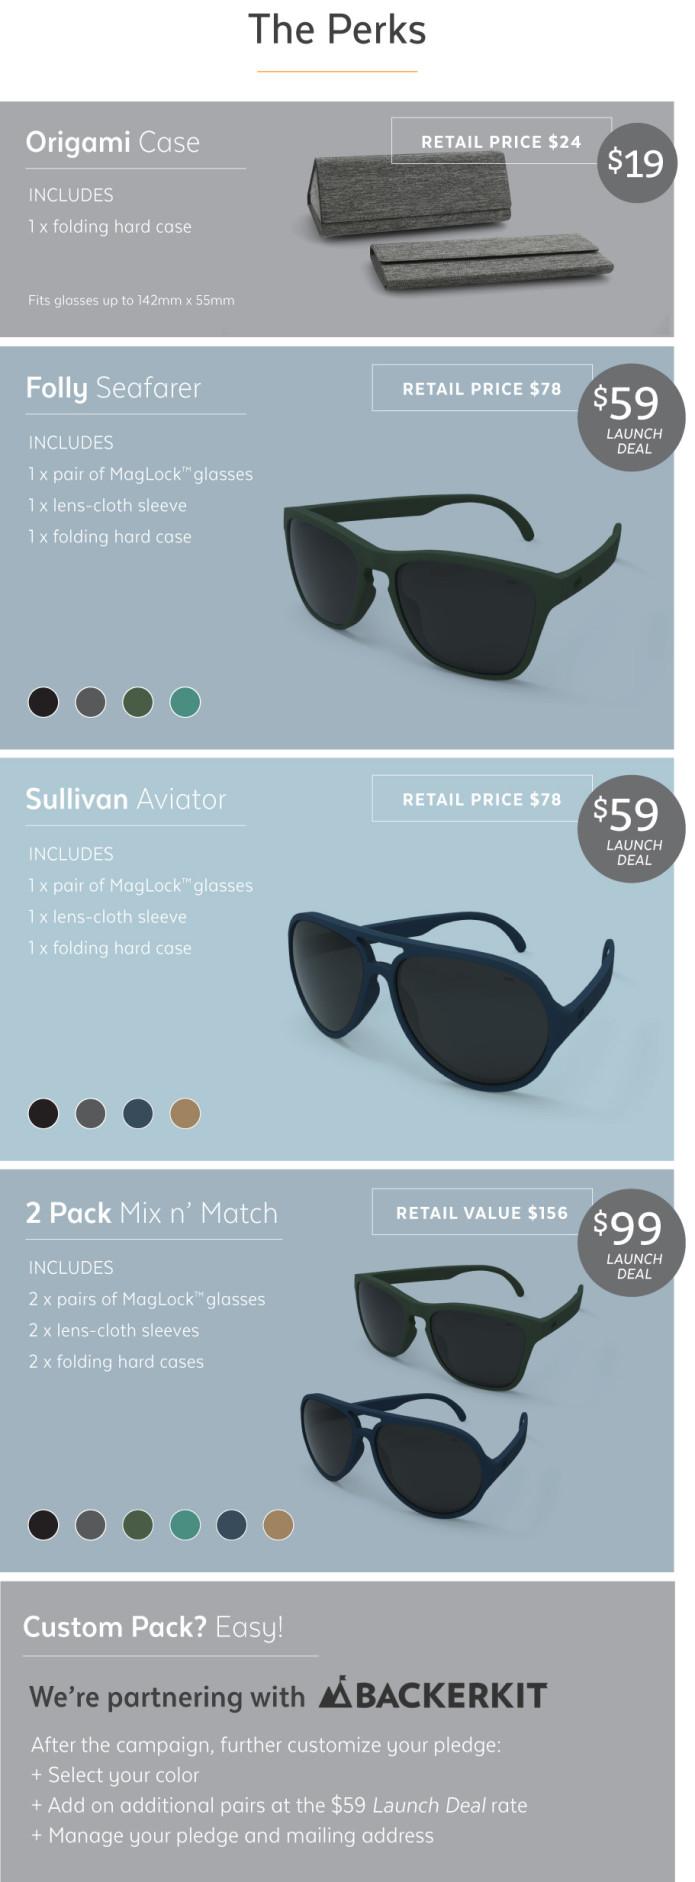 af74fa9d707f MagLock Sunglasses - Never dropped or left behind